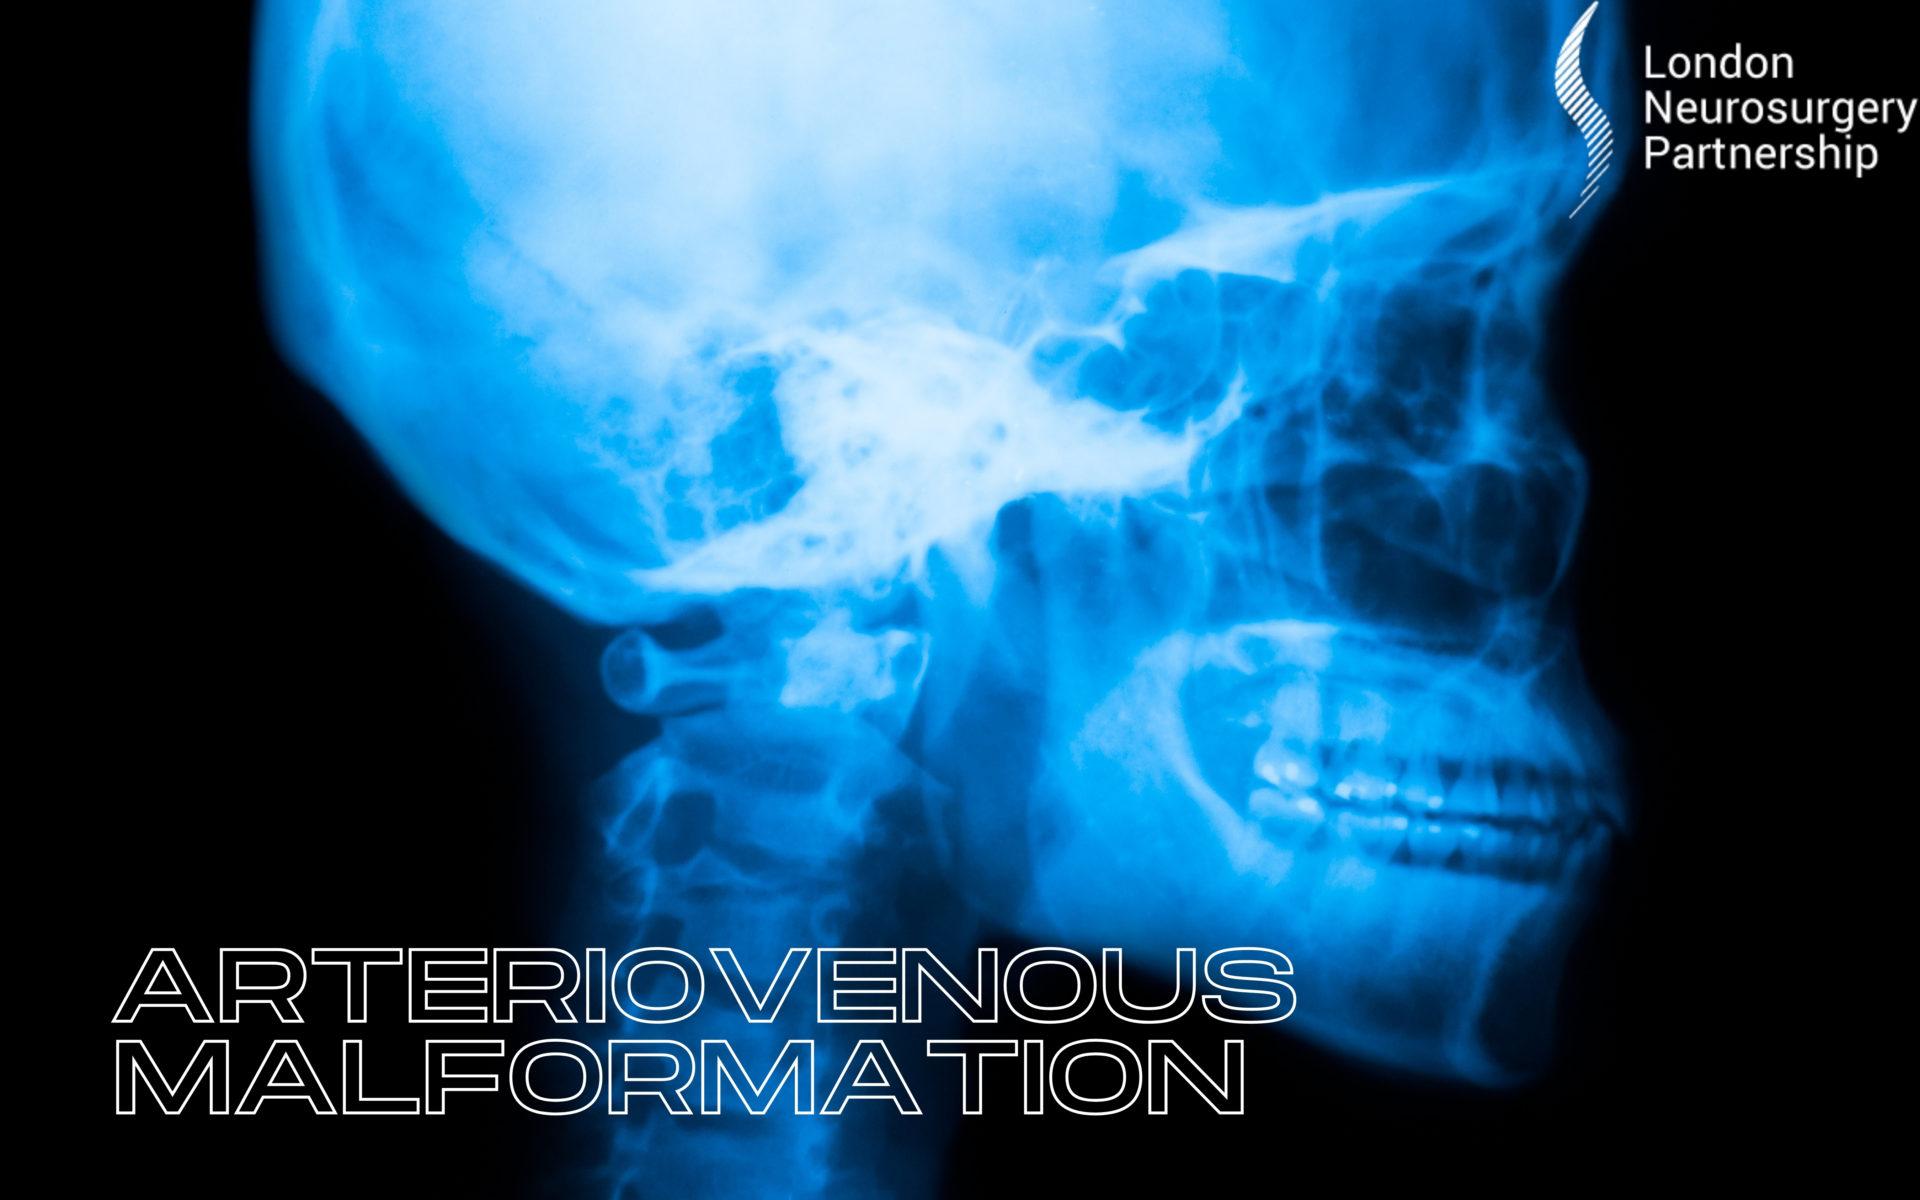 AVM Arteriovenous malformation